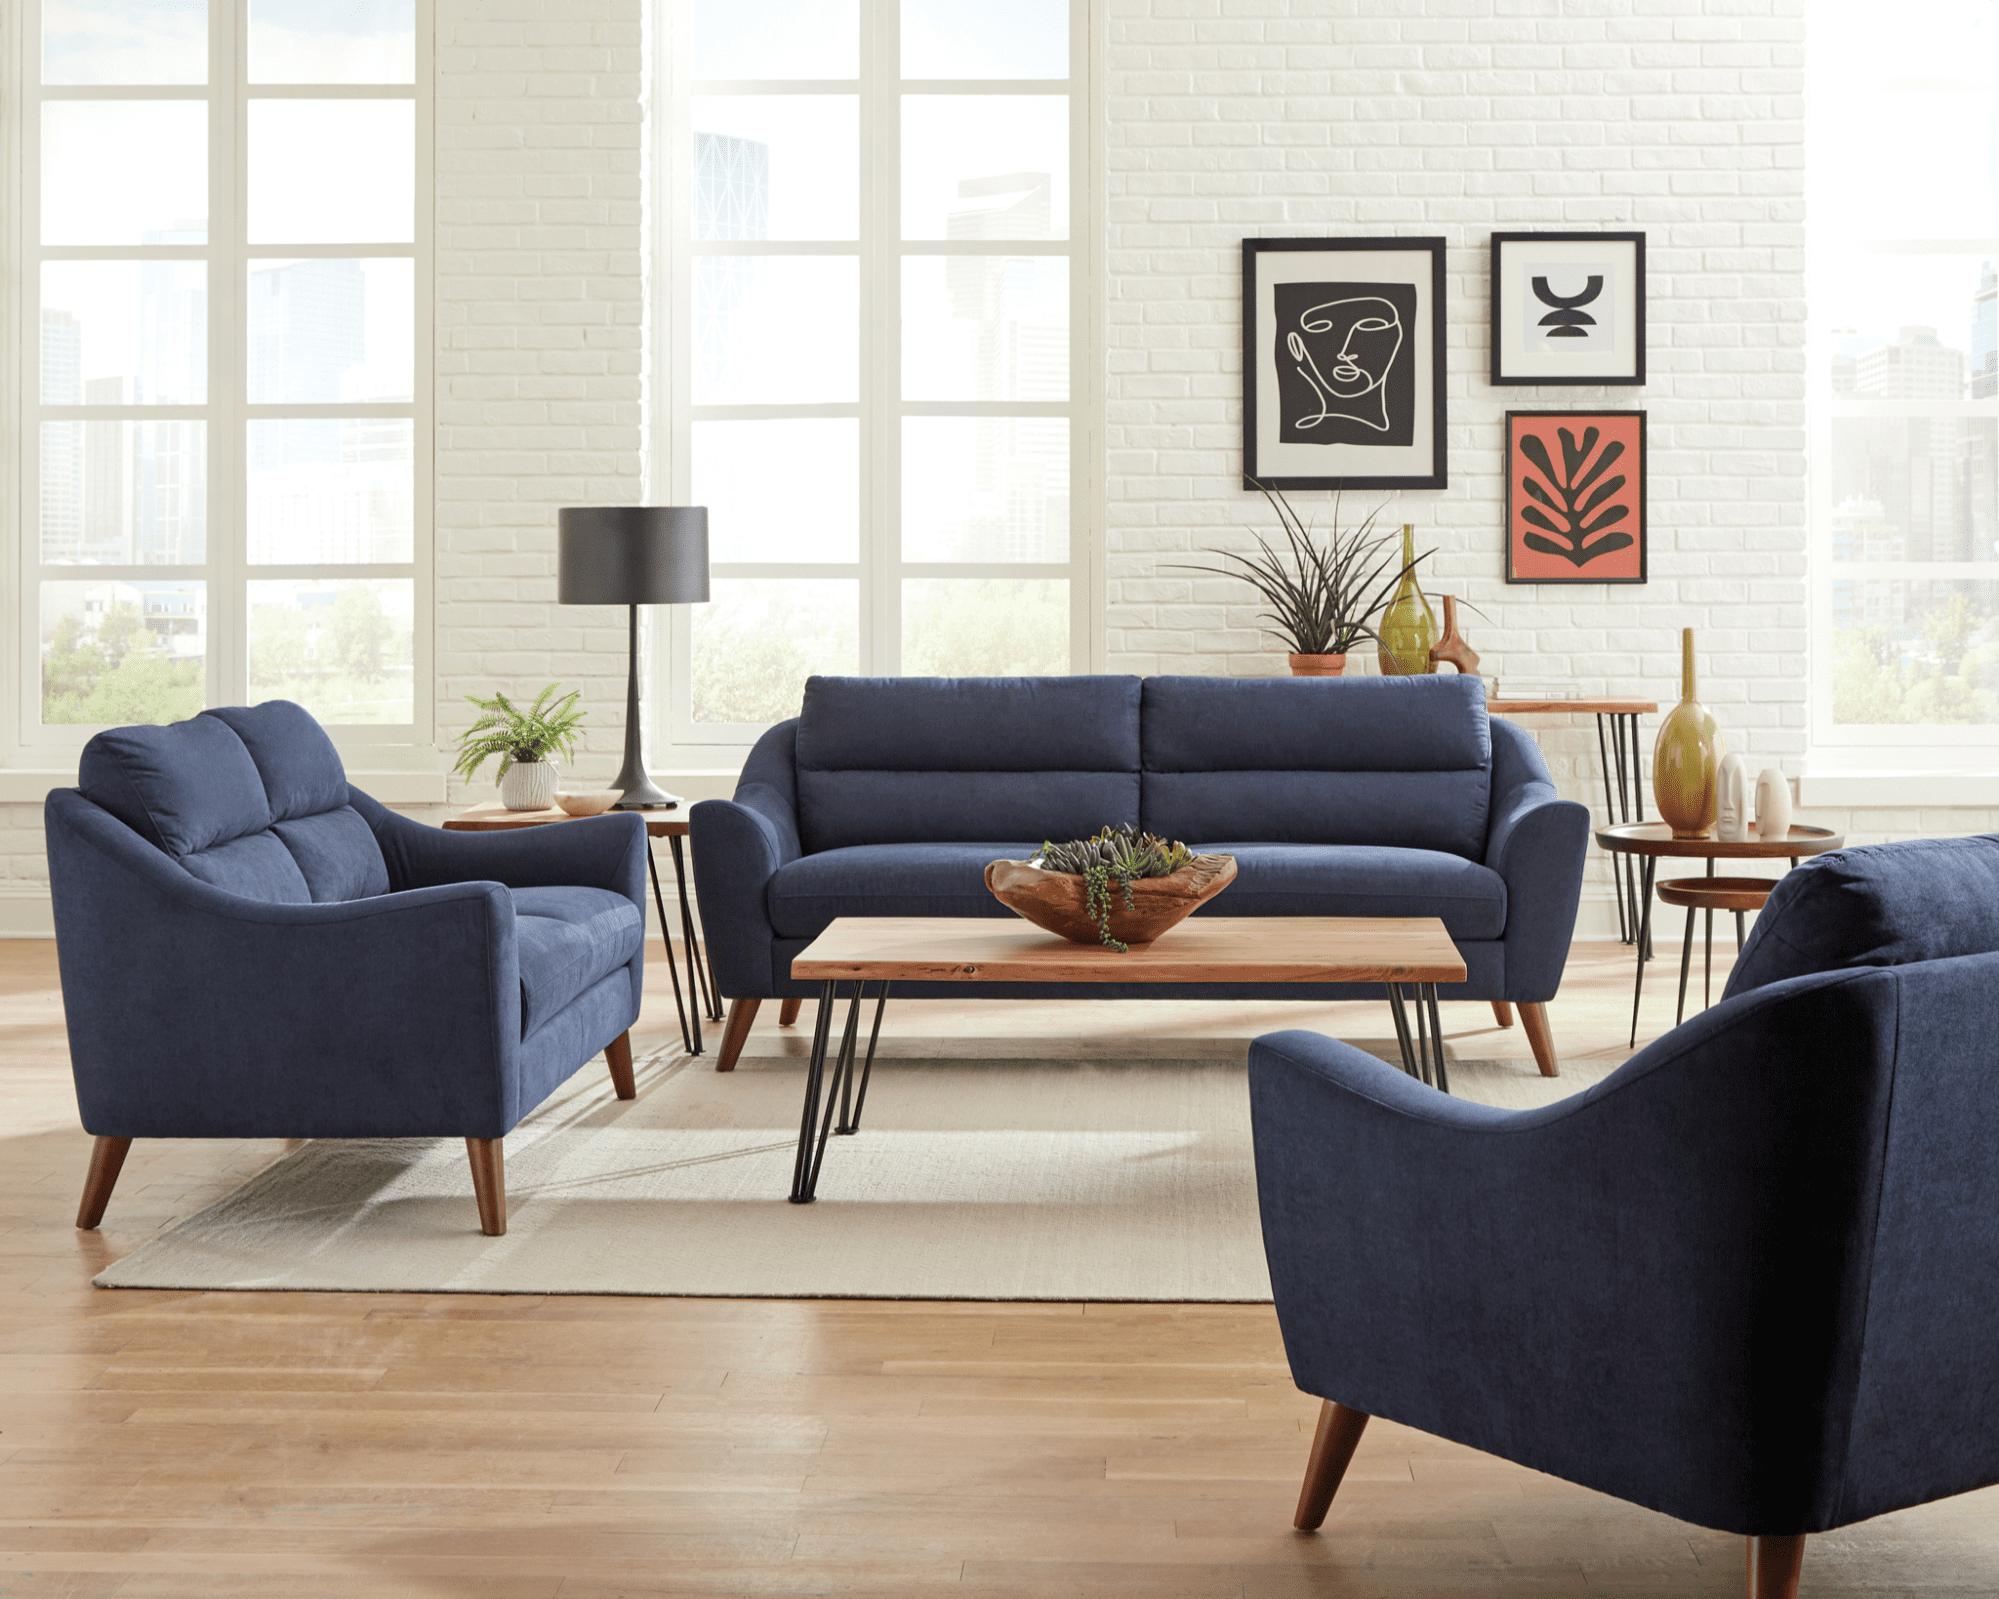 Modern Living Room Ideas How To, Living Room Ideas Modern